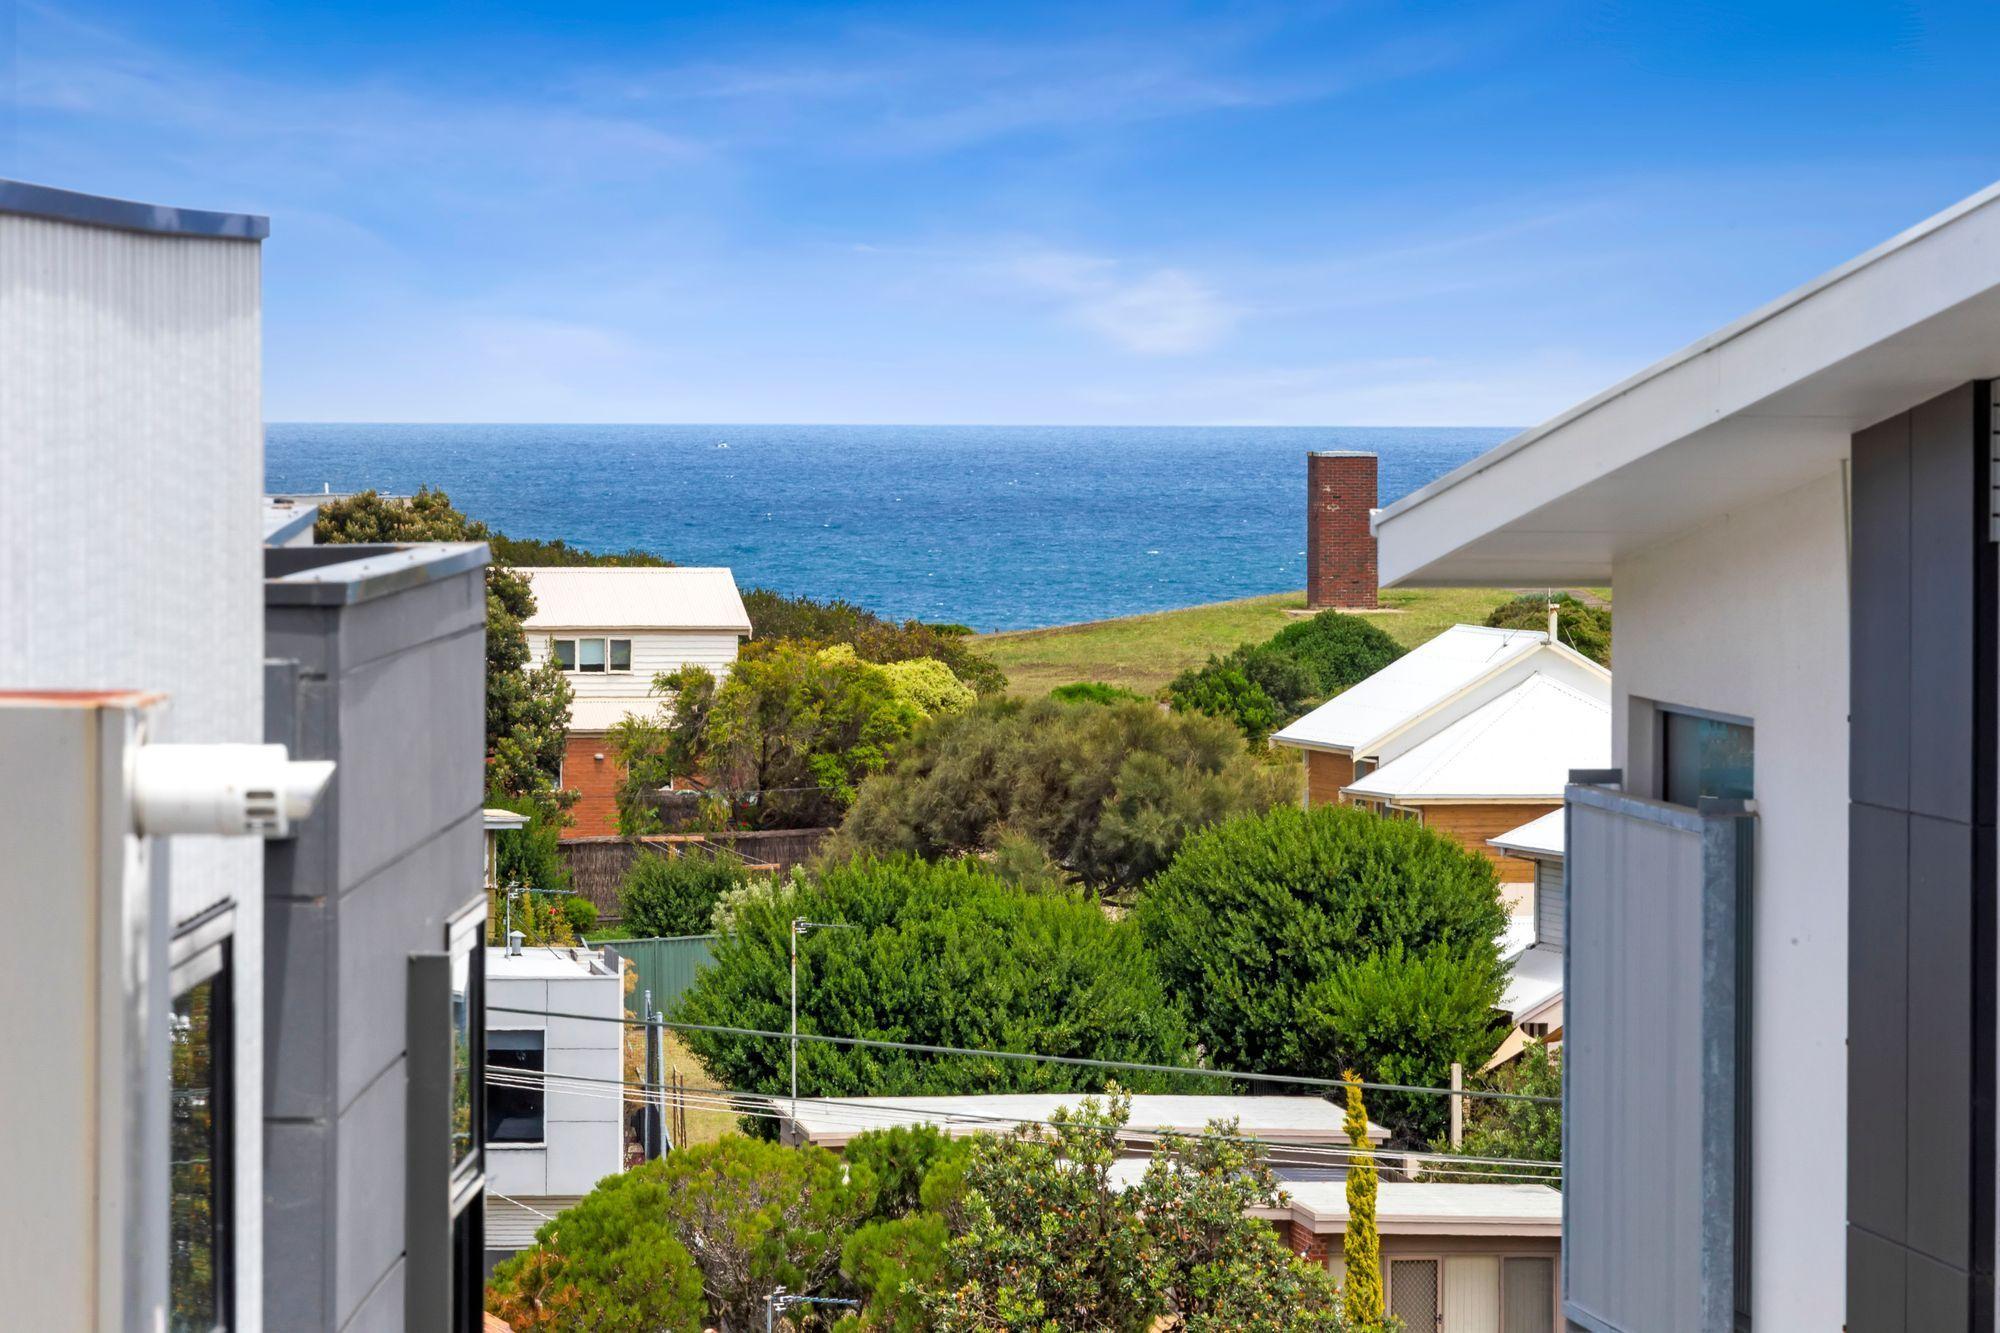 76 The Terrace, Ocean Grove VIC 3226